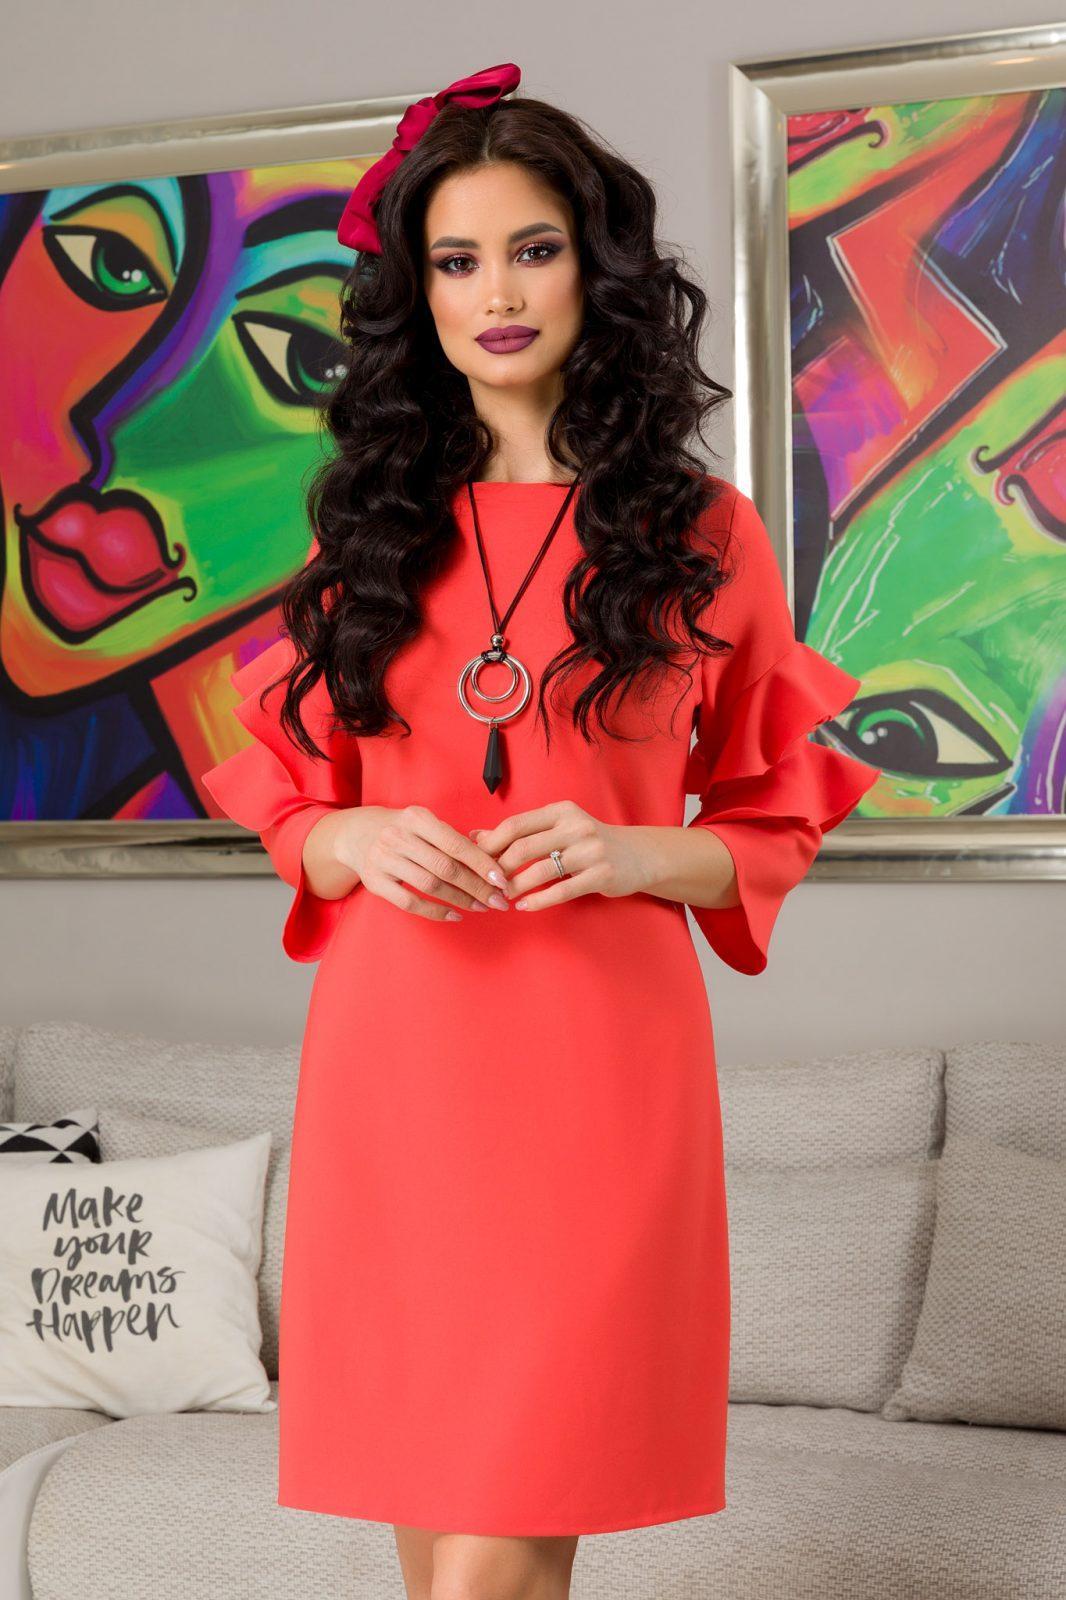 Hanna Κοραλί Φόρεμα 7260